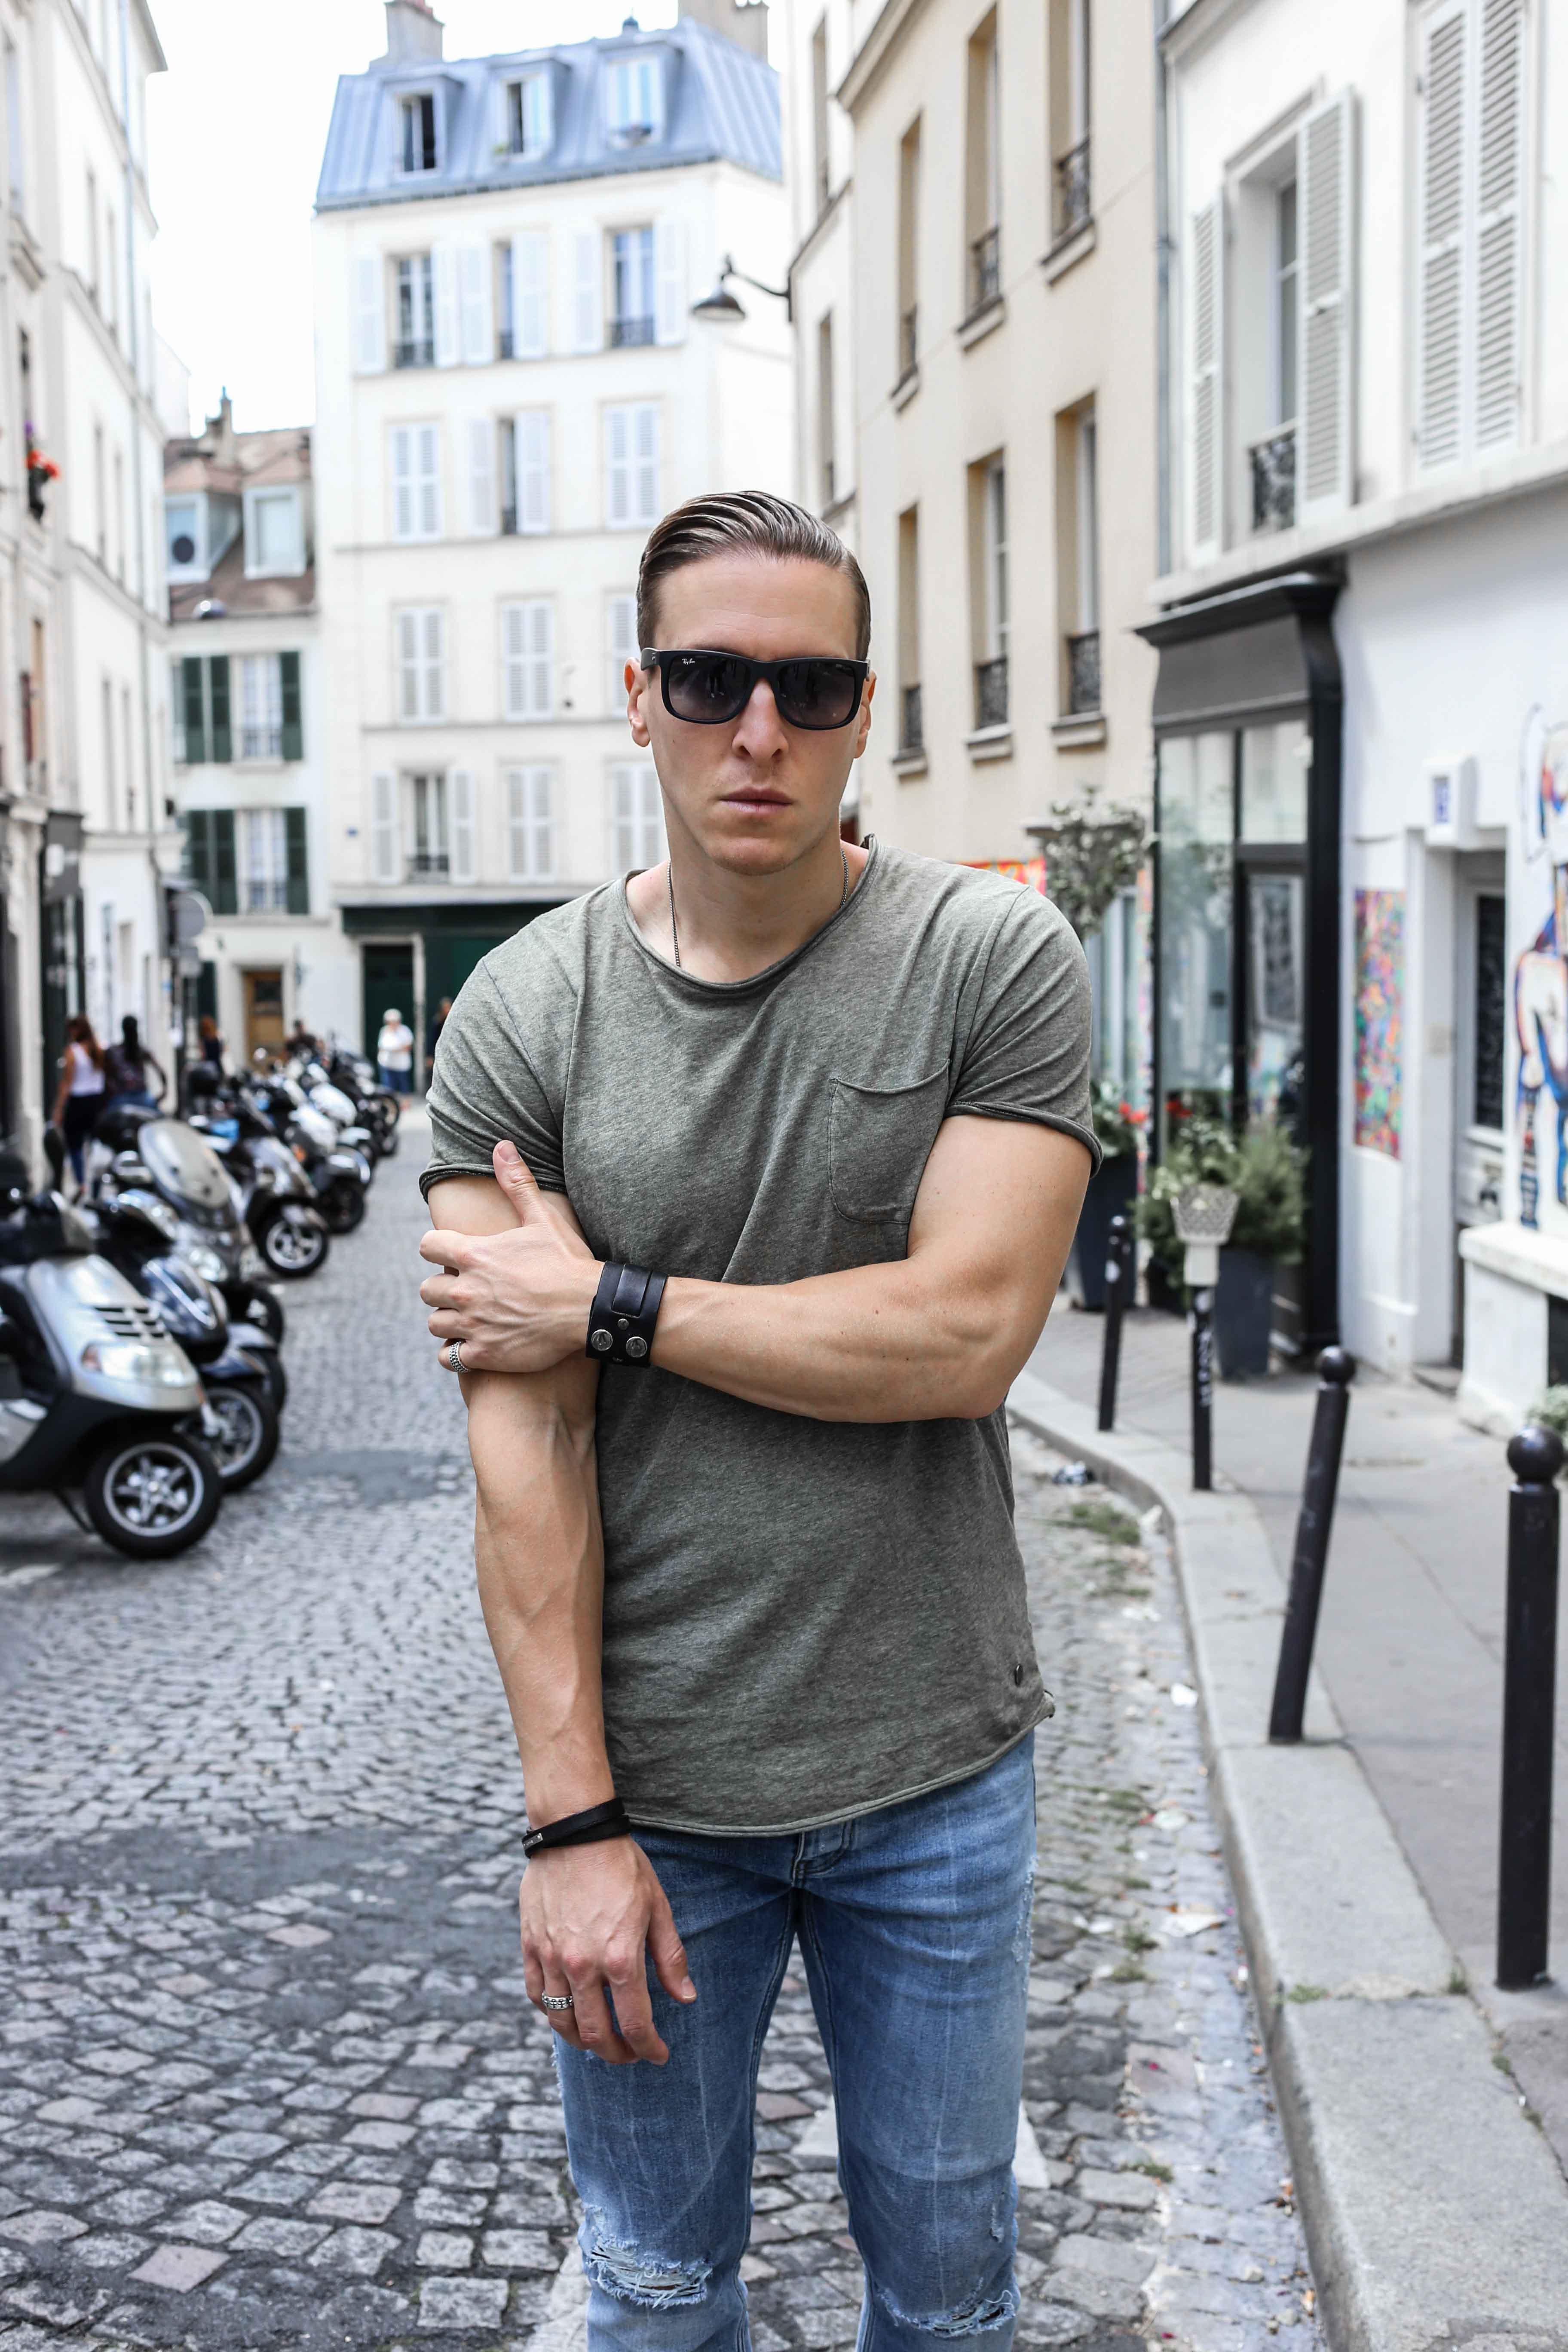 männerblog-modeblog-outfit-paris-basic-look-grünes-tshirt-ripped-jeans-nike-air-max-2017_2349